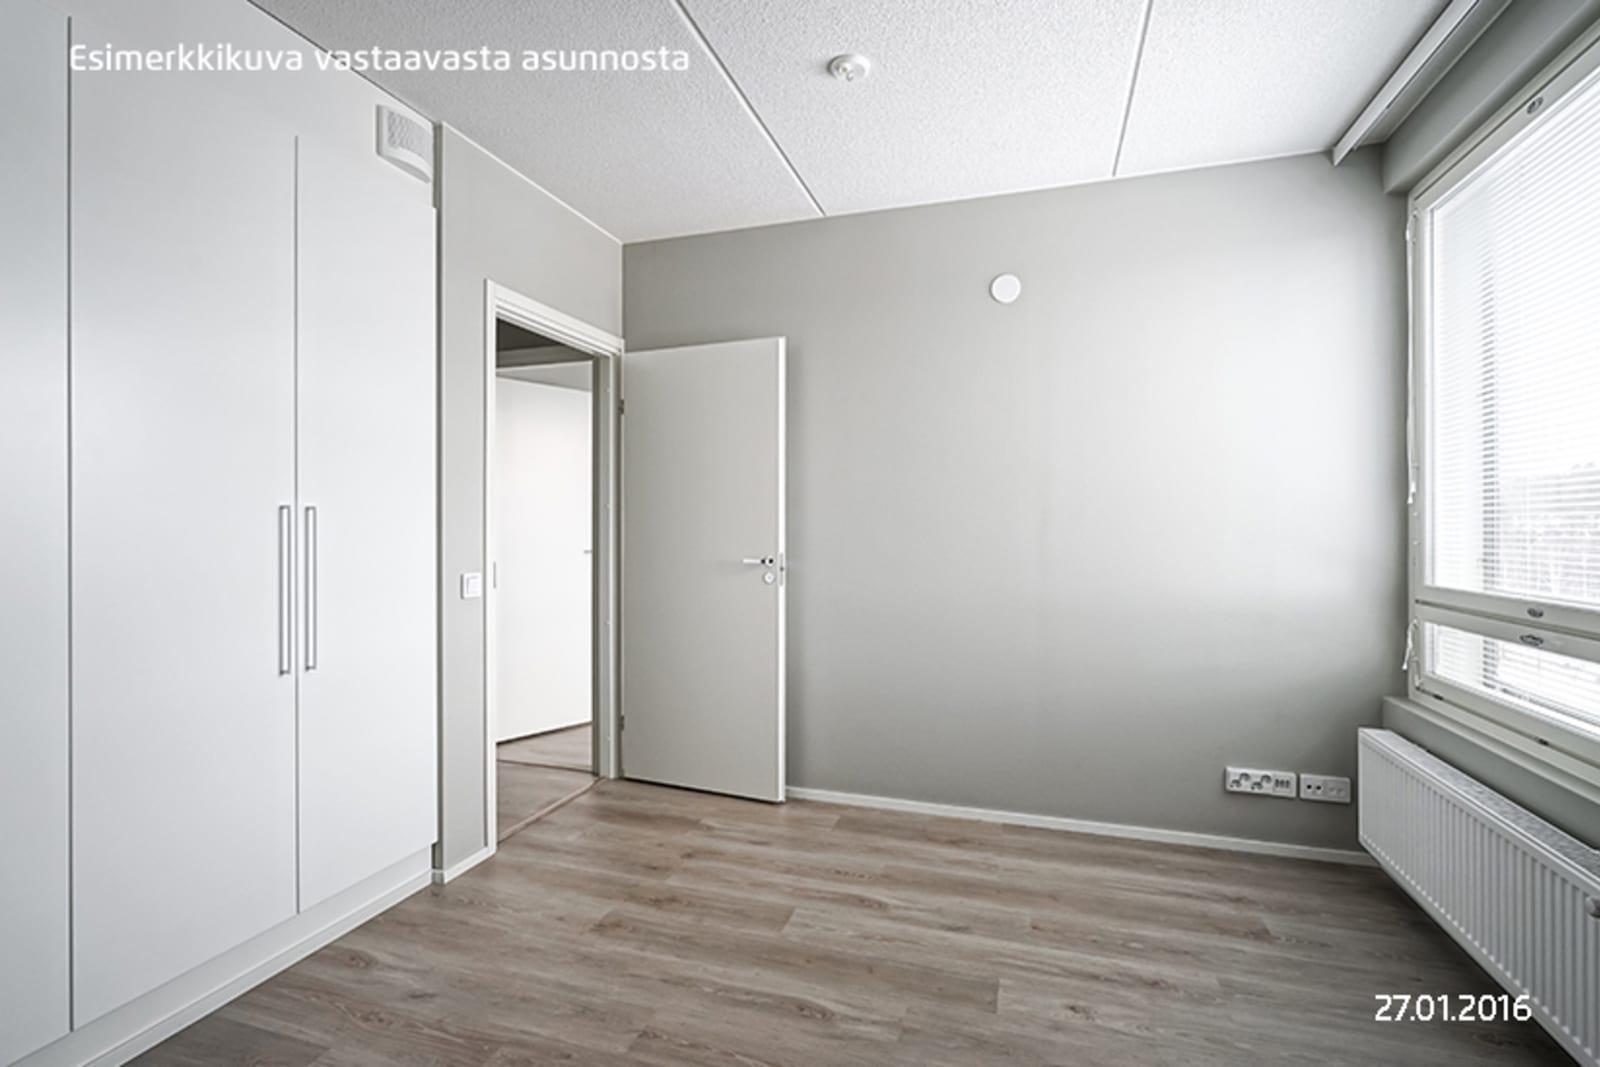 Espoo, Saunalahti, Magneettikatu 8 A 027